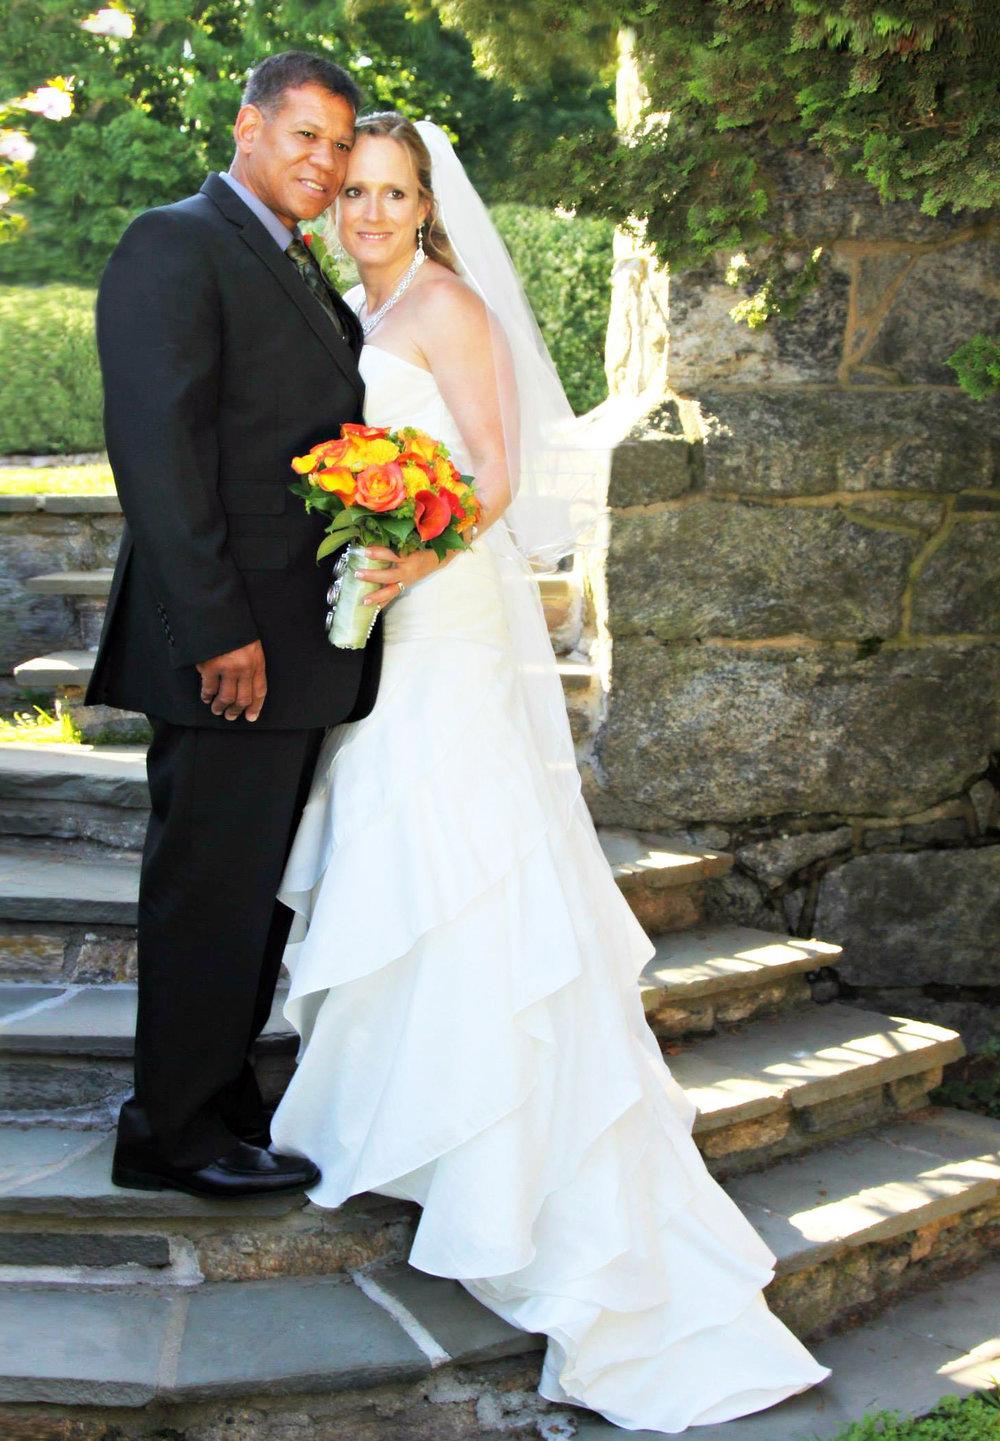 calvary church wedding photo juliet hodges.jpg